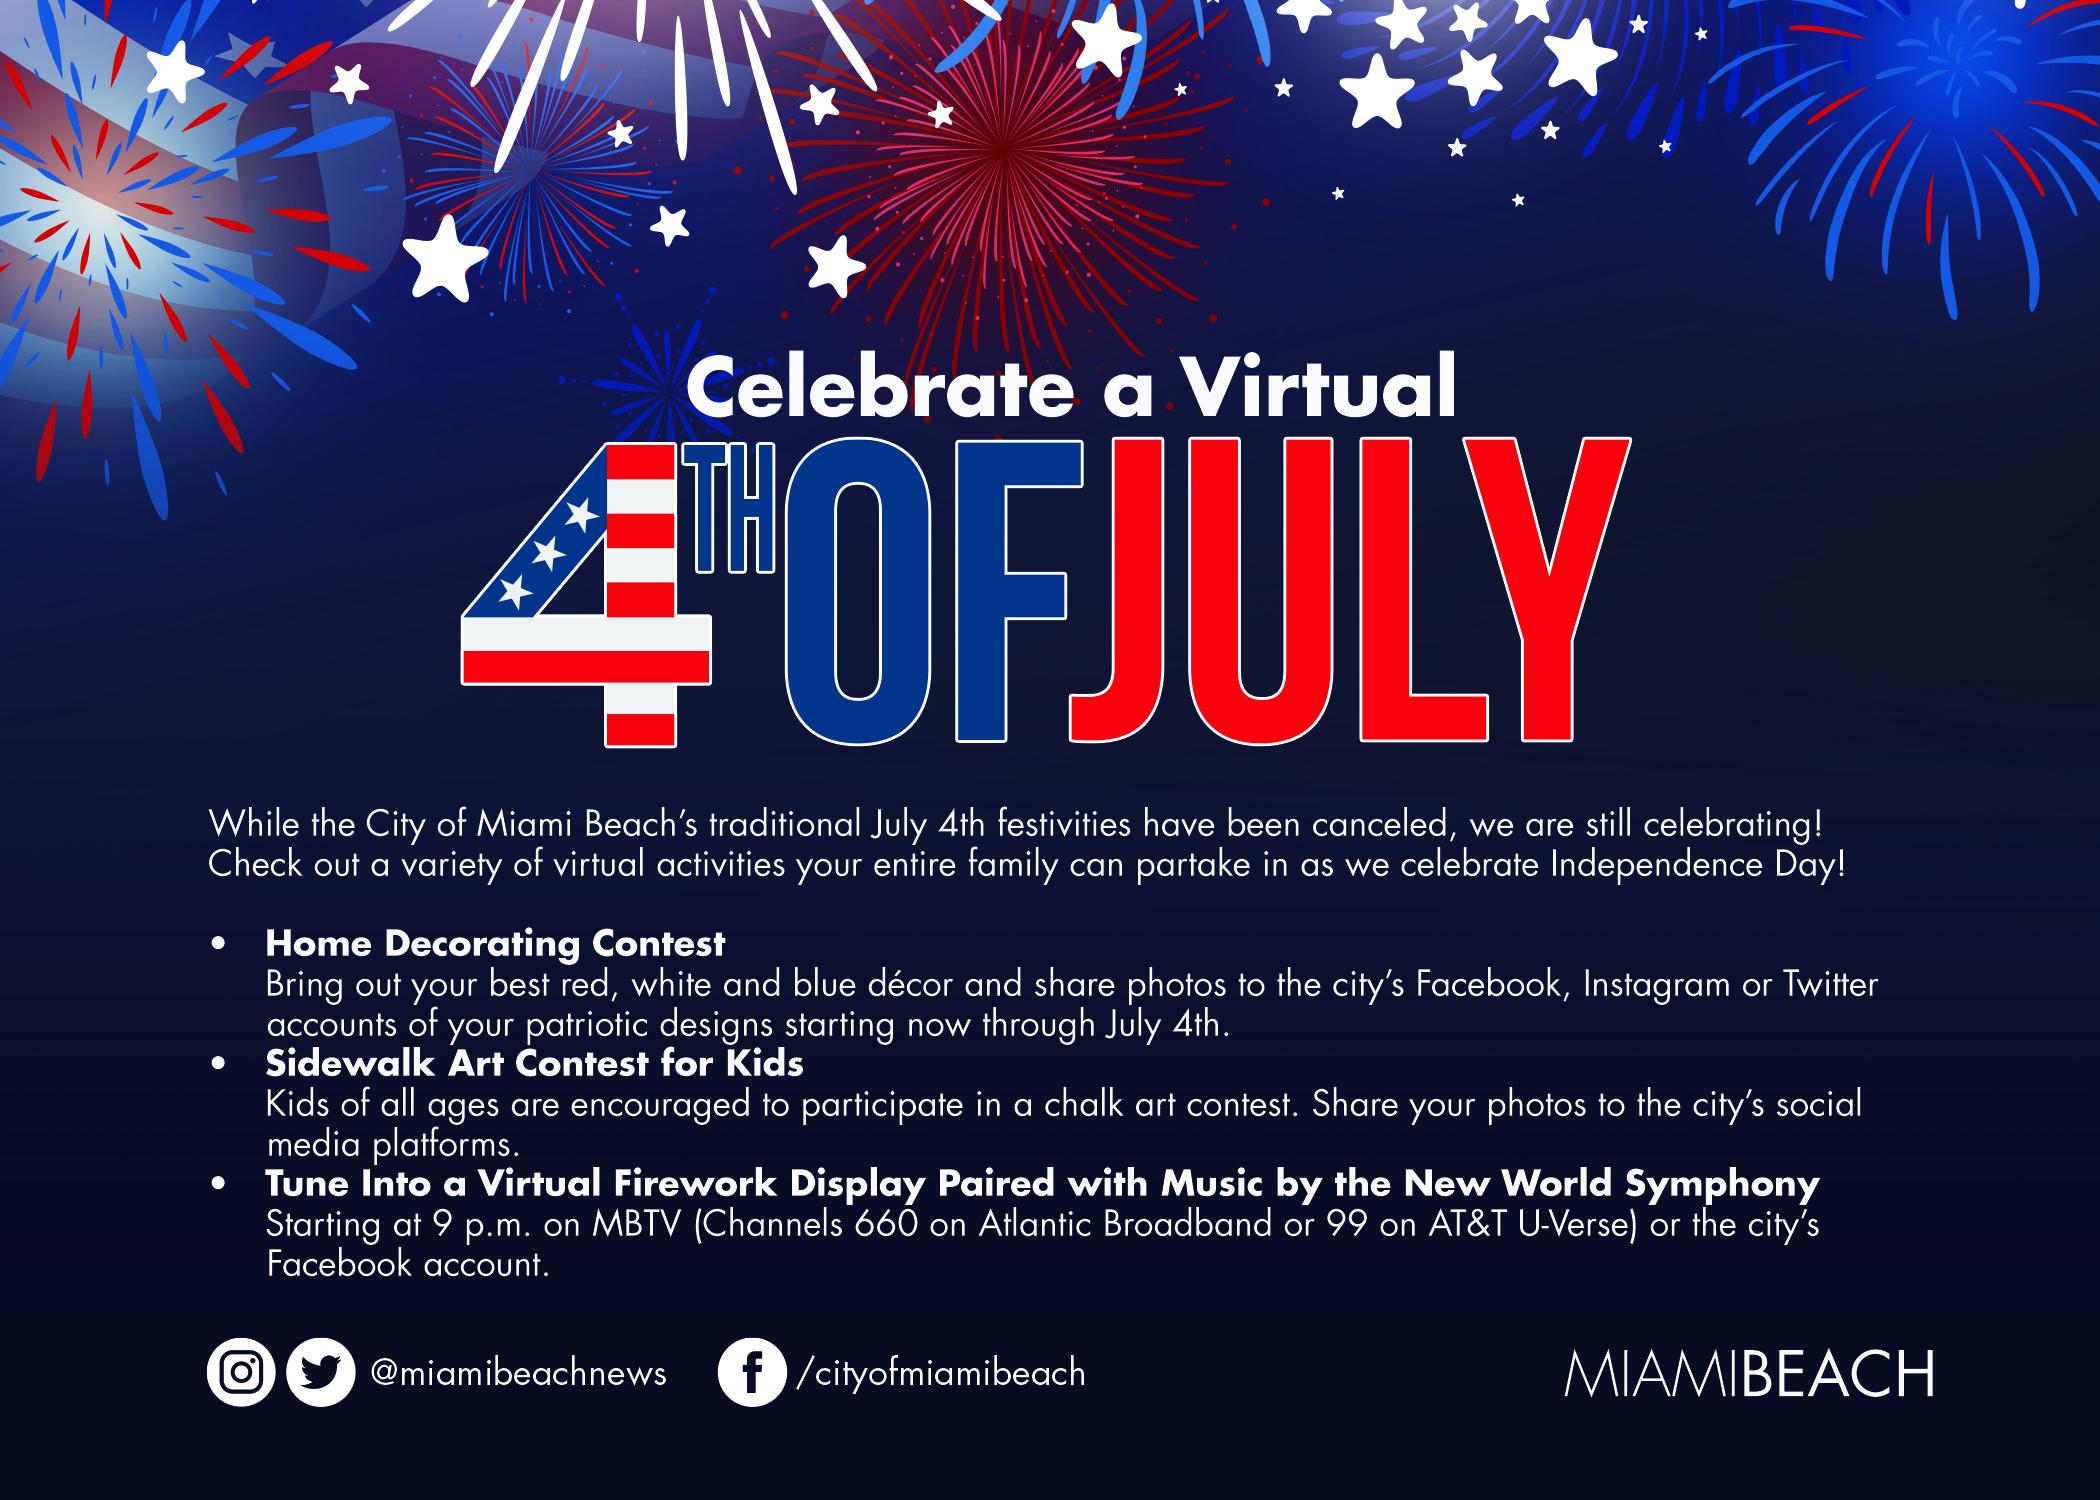 Virtual July 4th Celebration